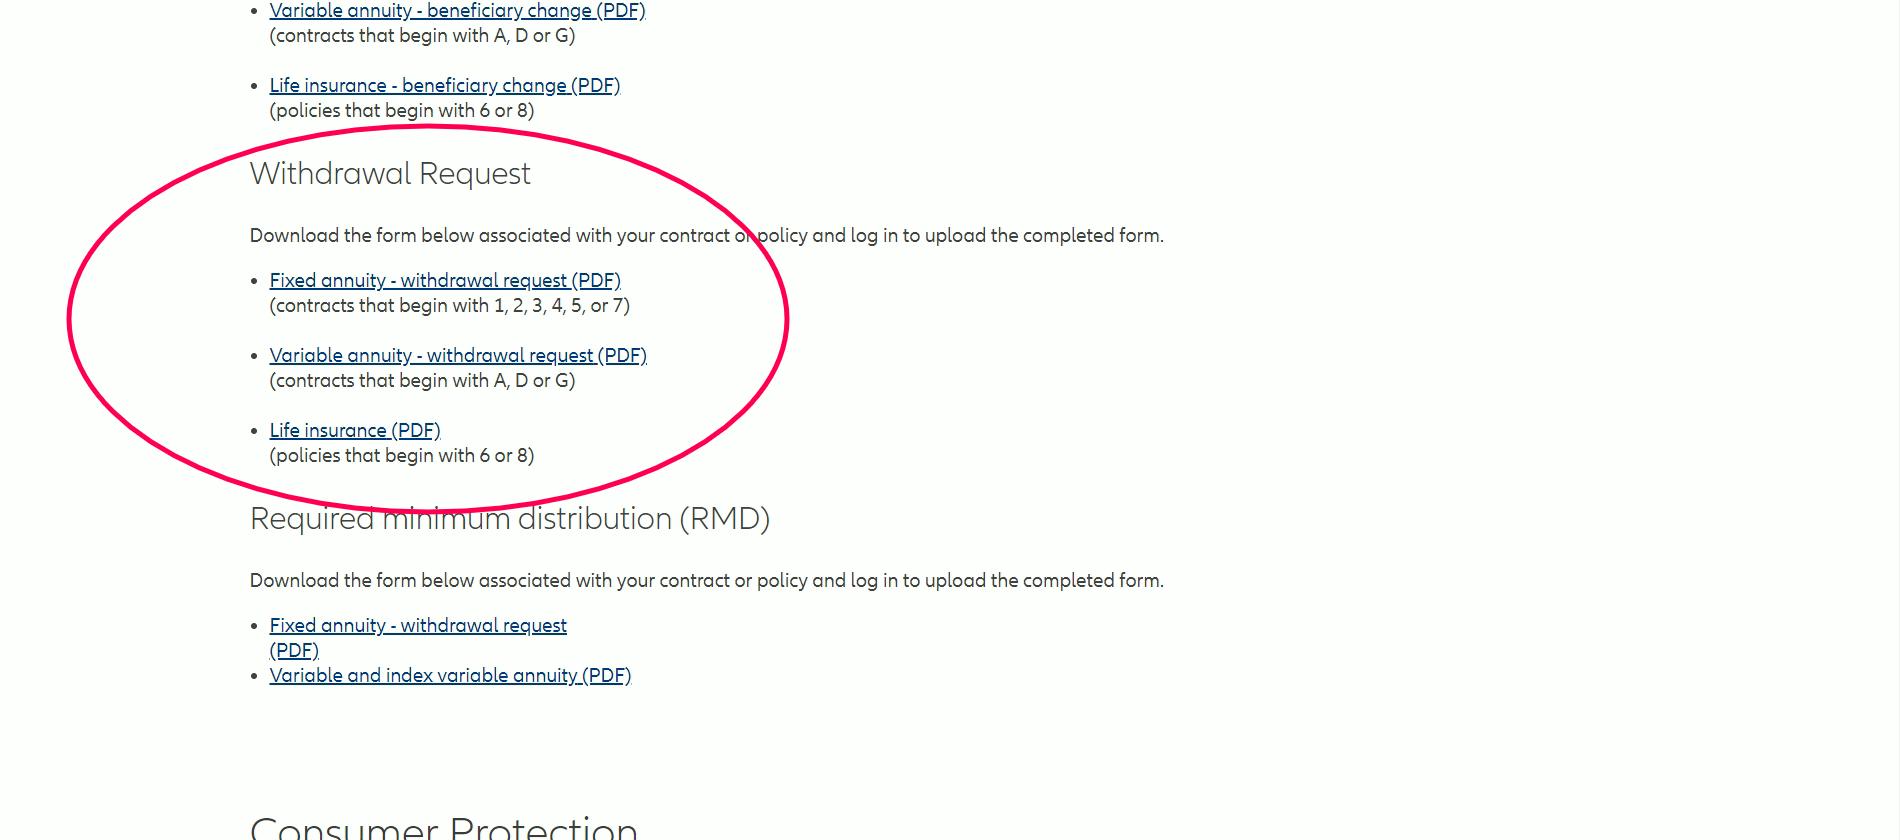 Allianz Website Withdrawal Request Highlight